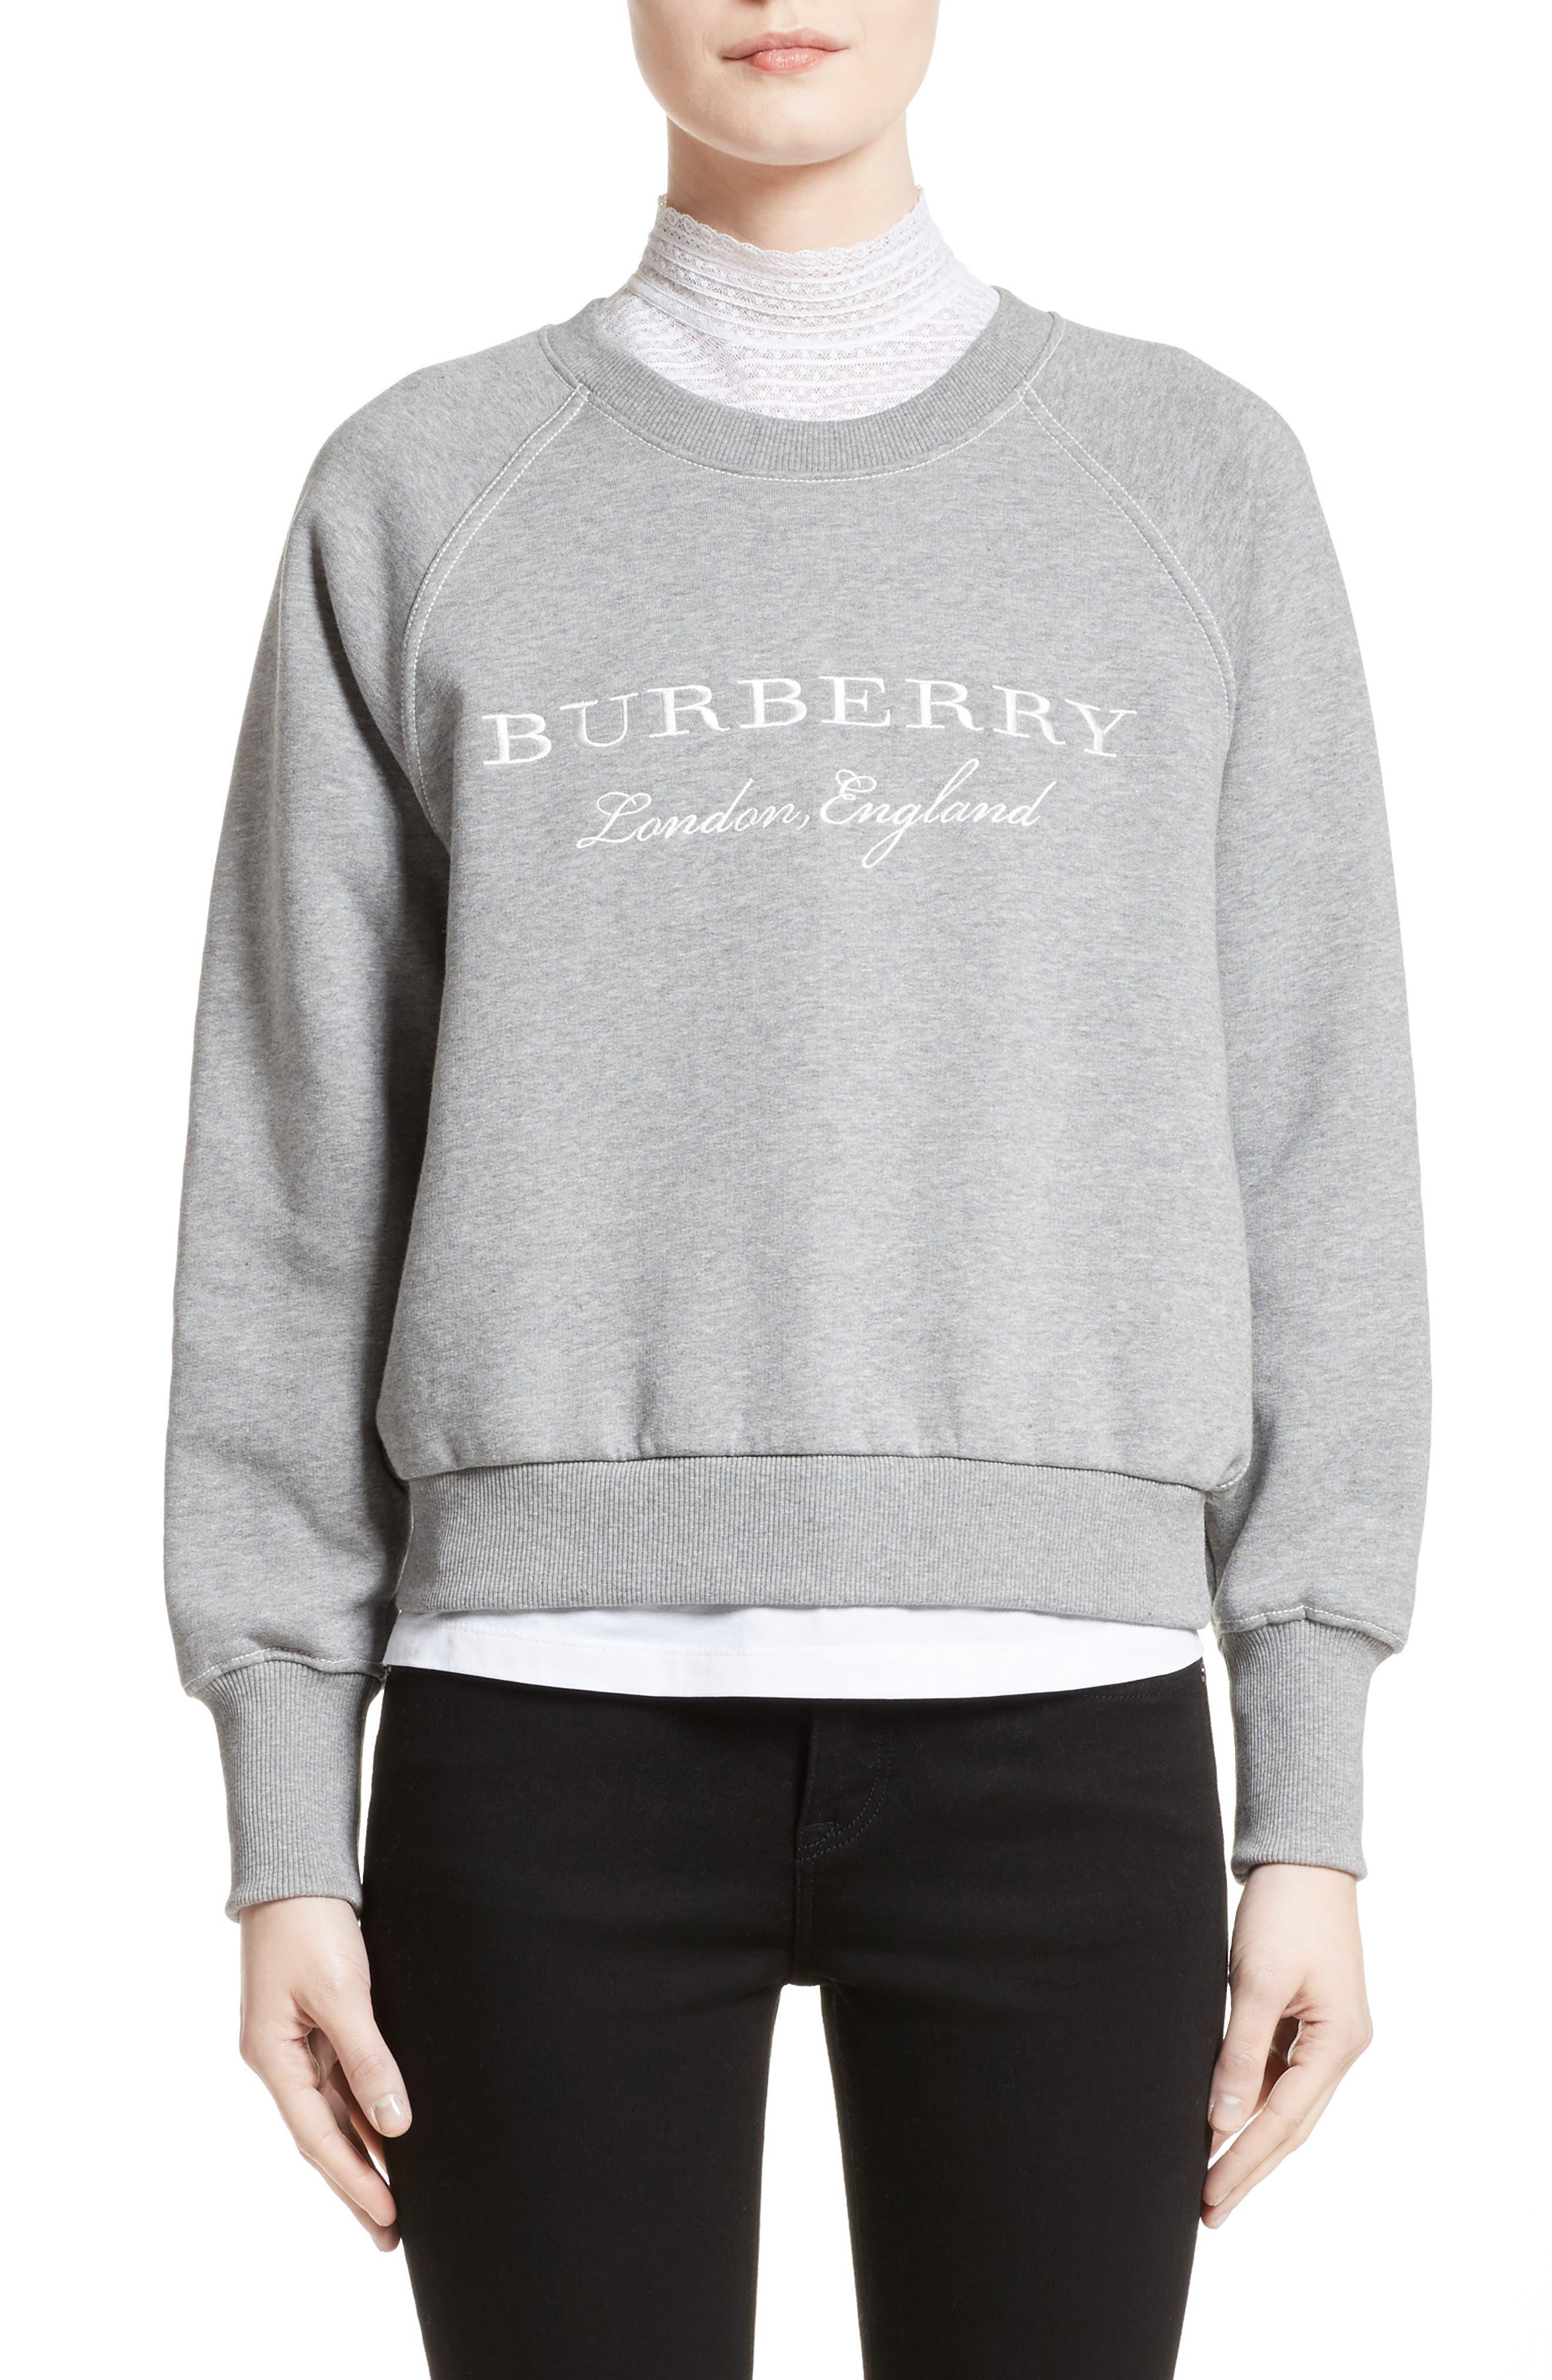 Burberry Torto Embroidered Sweatshirt